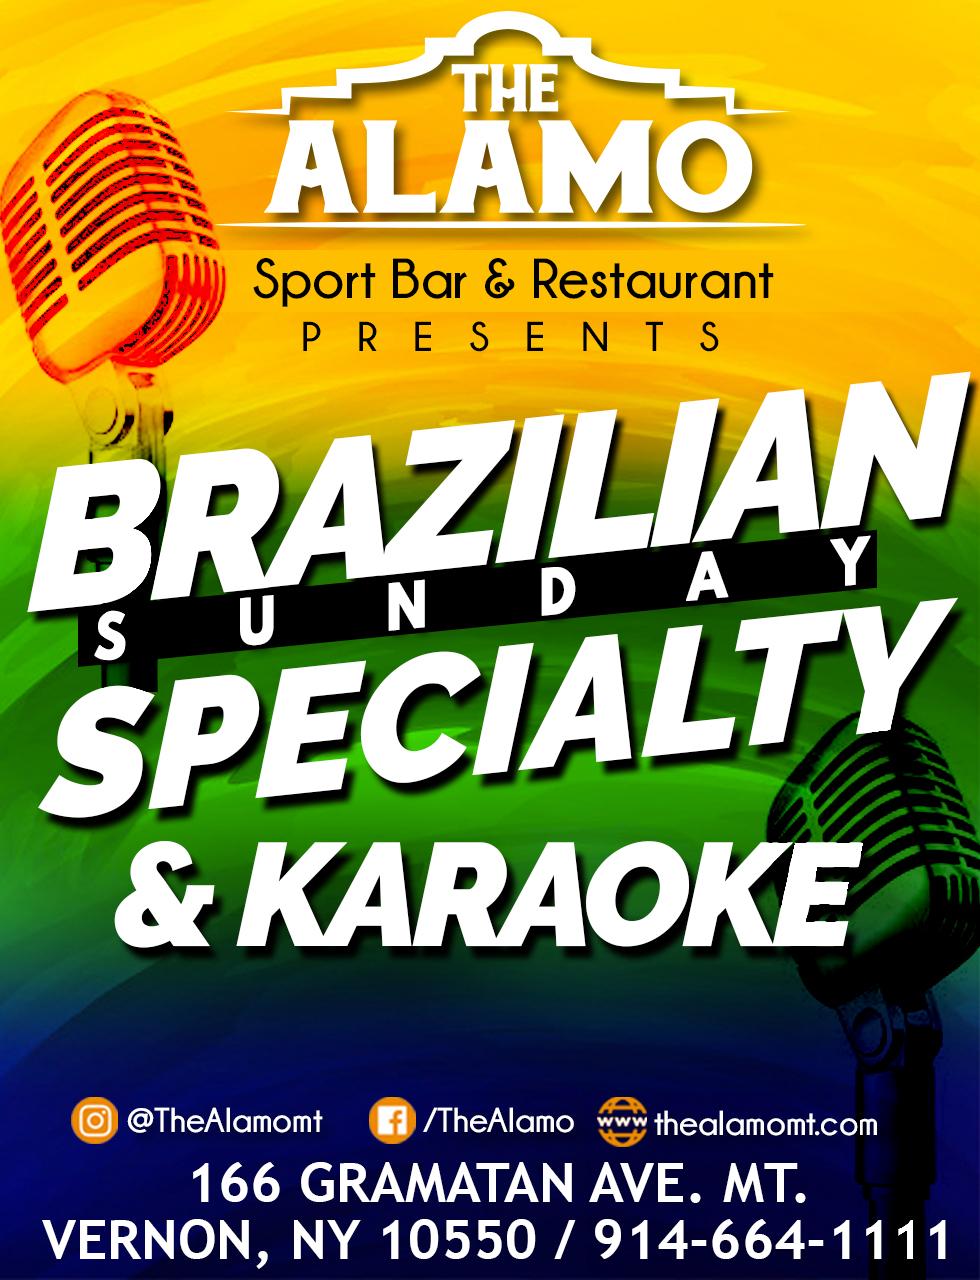 BRAZILIAN SPECIALTY